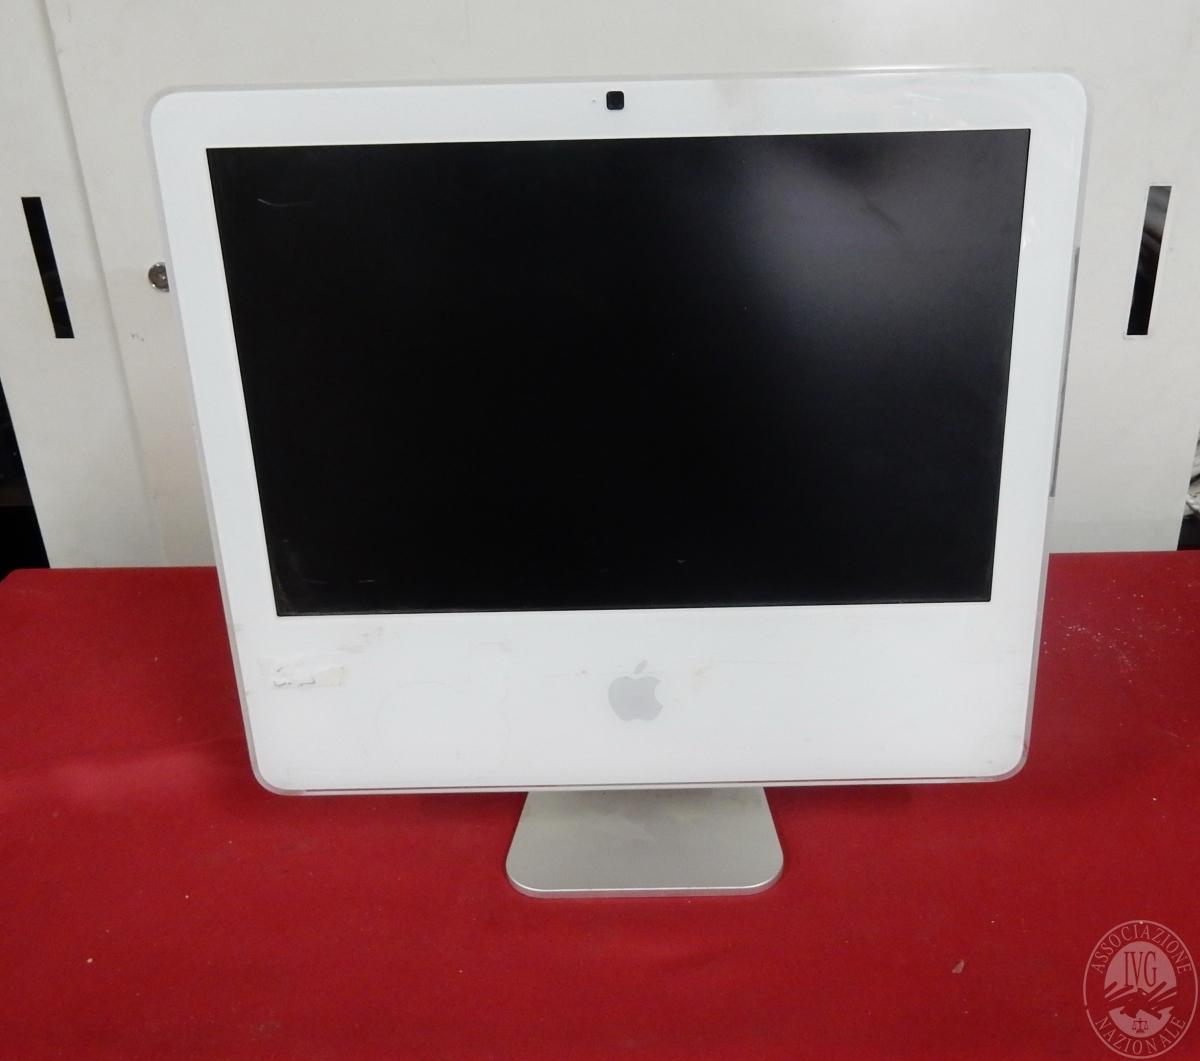 Computer I MAC 17 pollici   VENDITA ONLINE